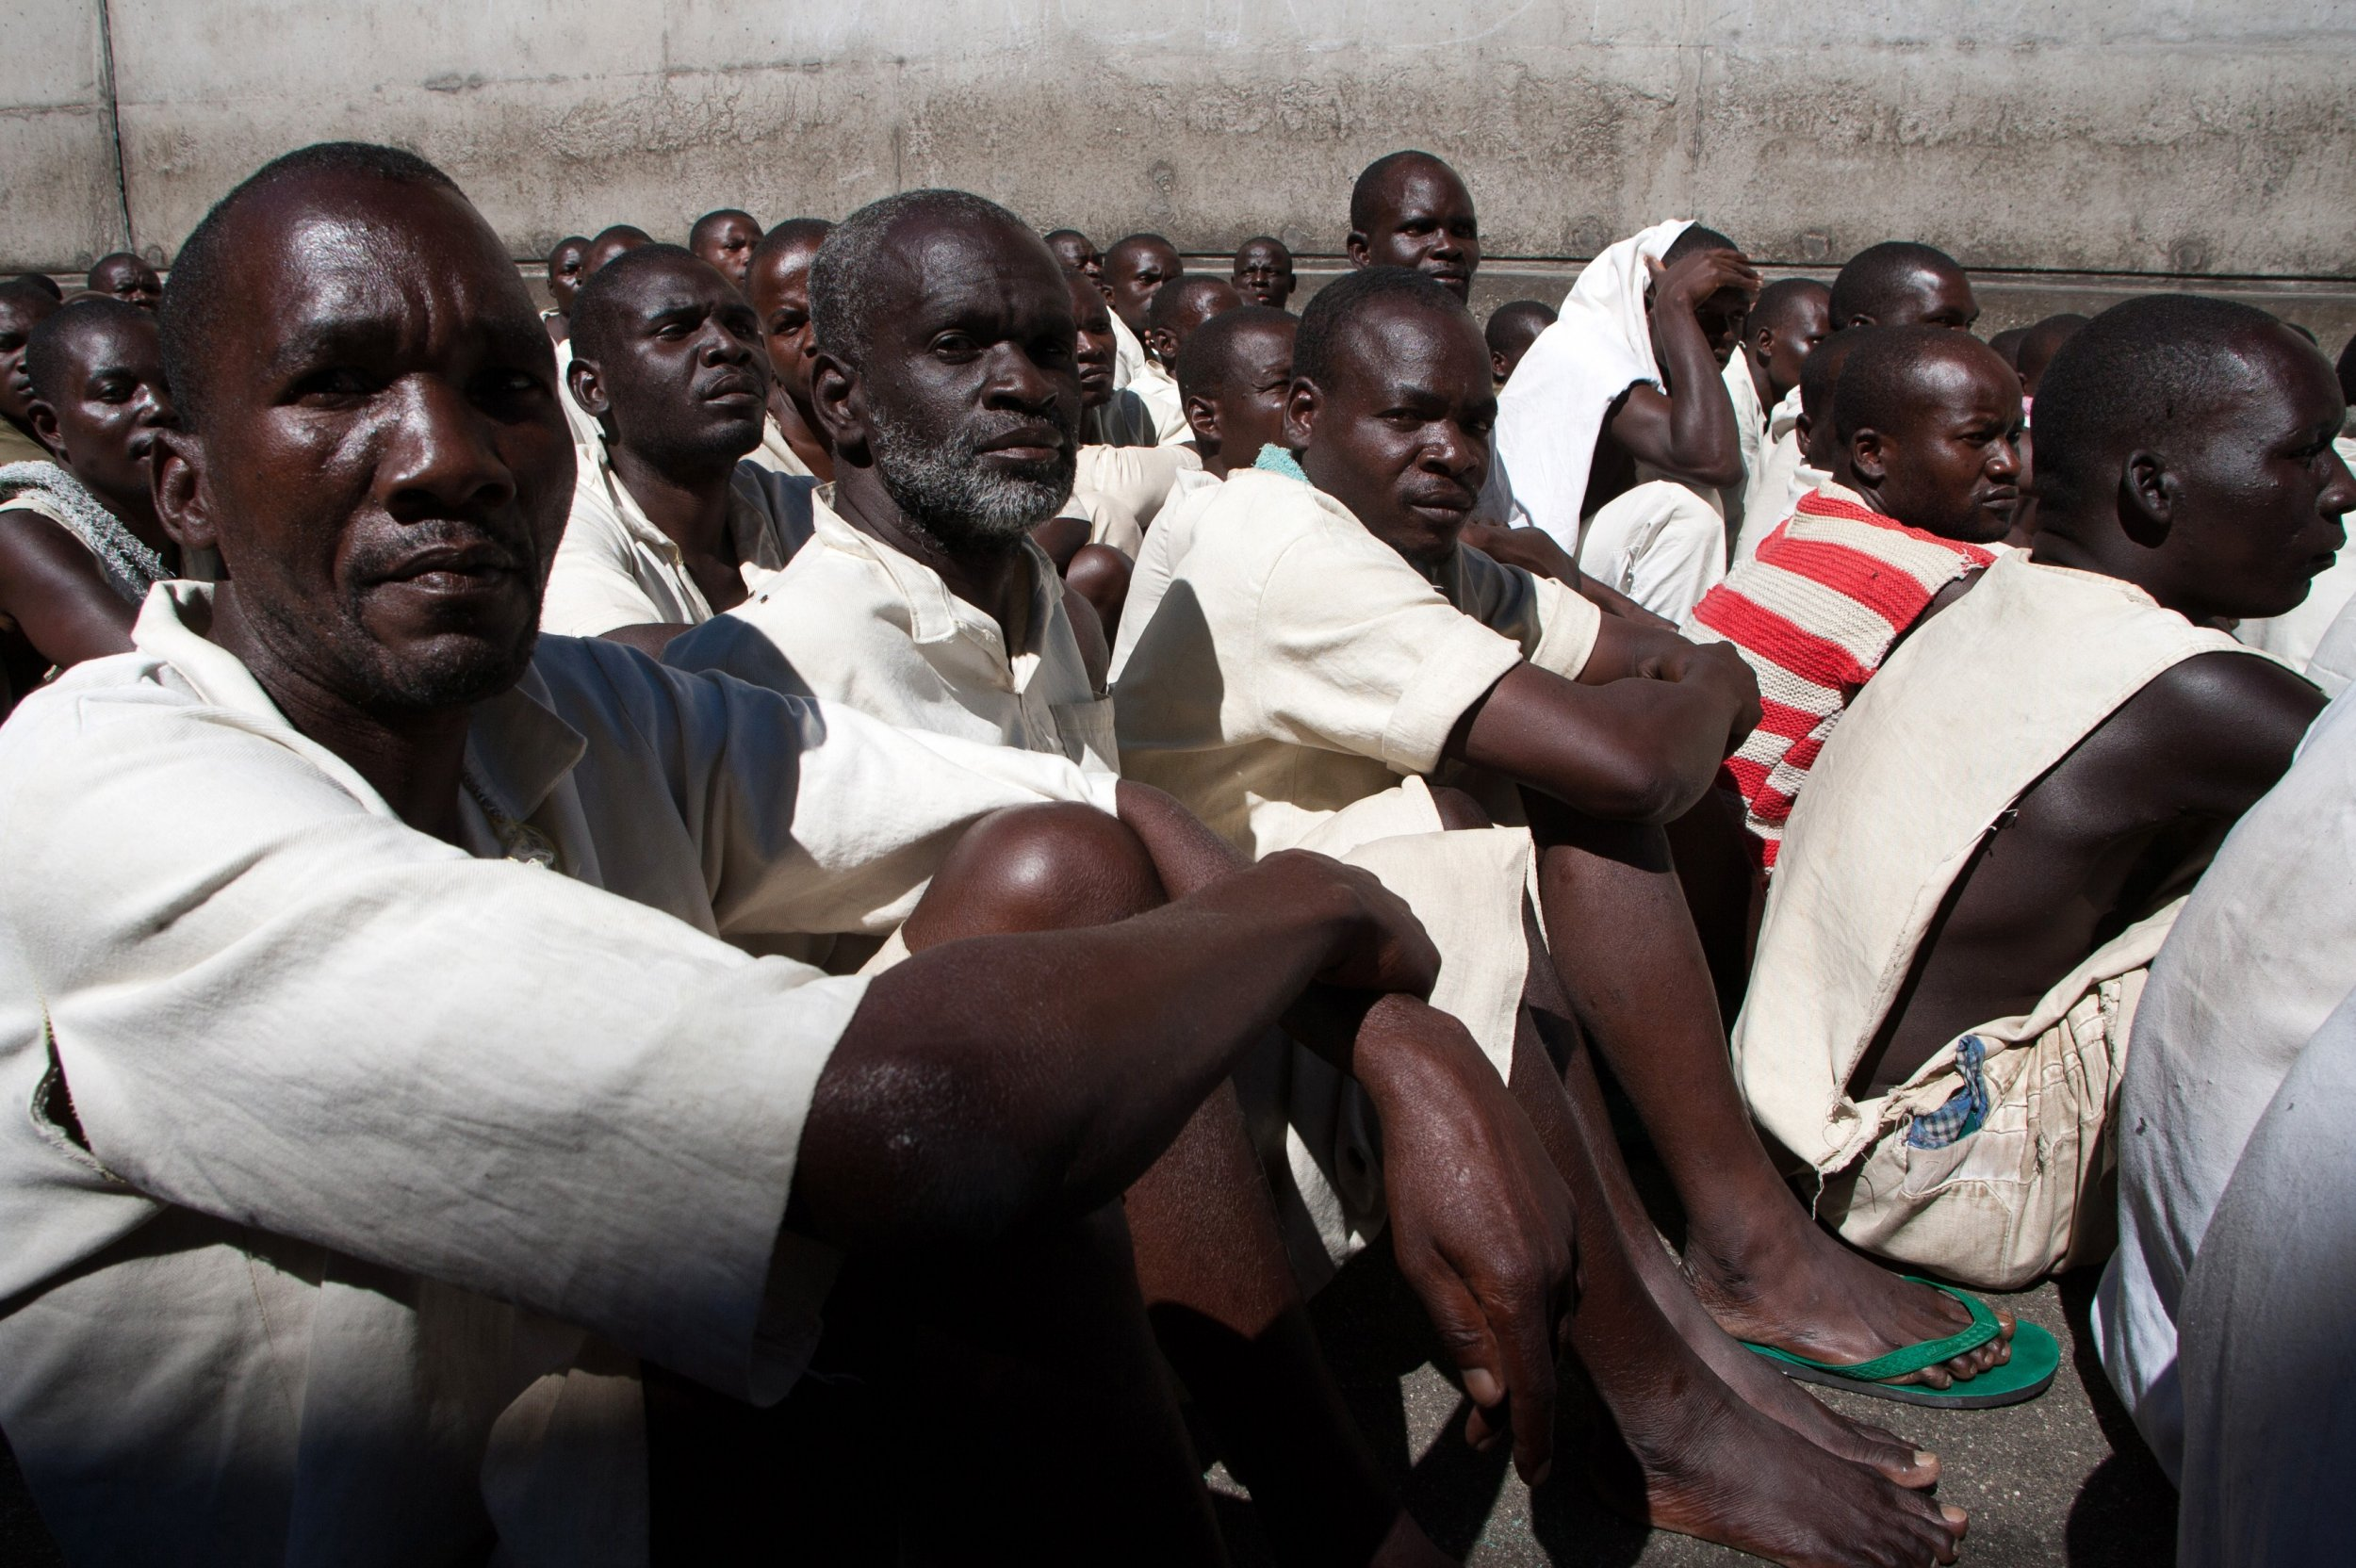 Zimbabwe prisoners sit in yard.